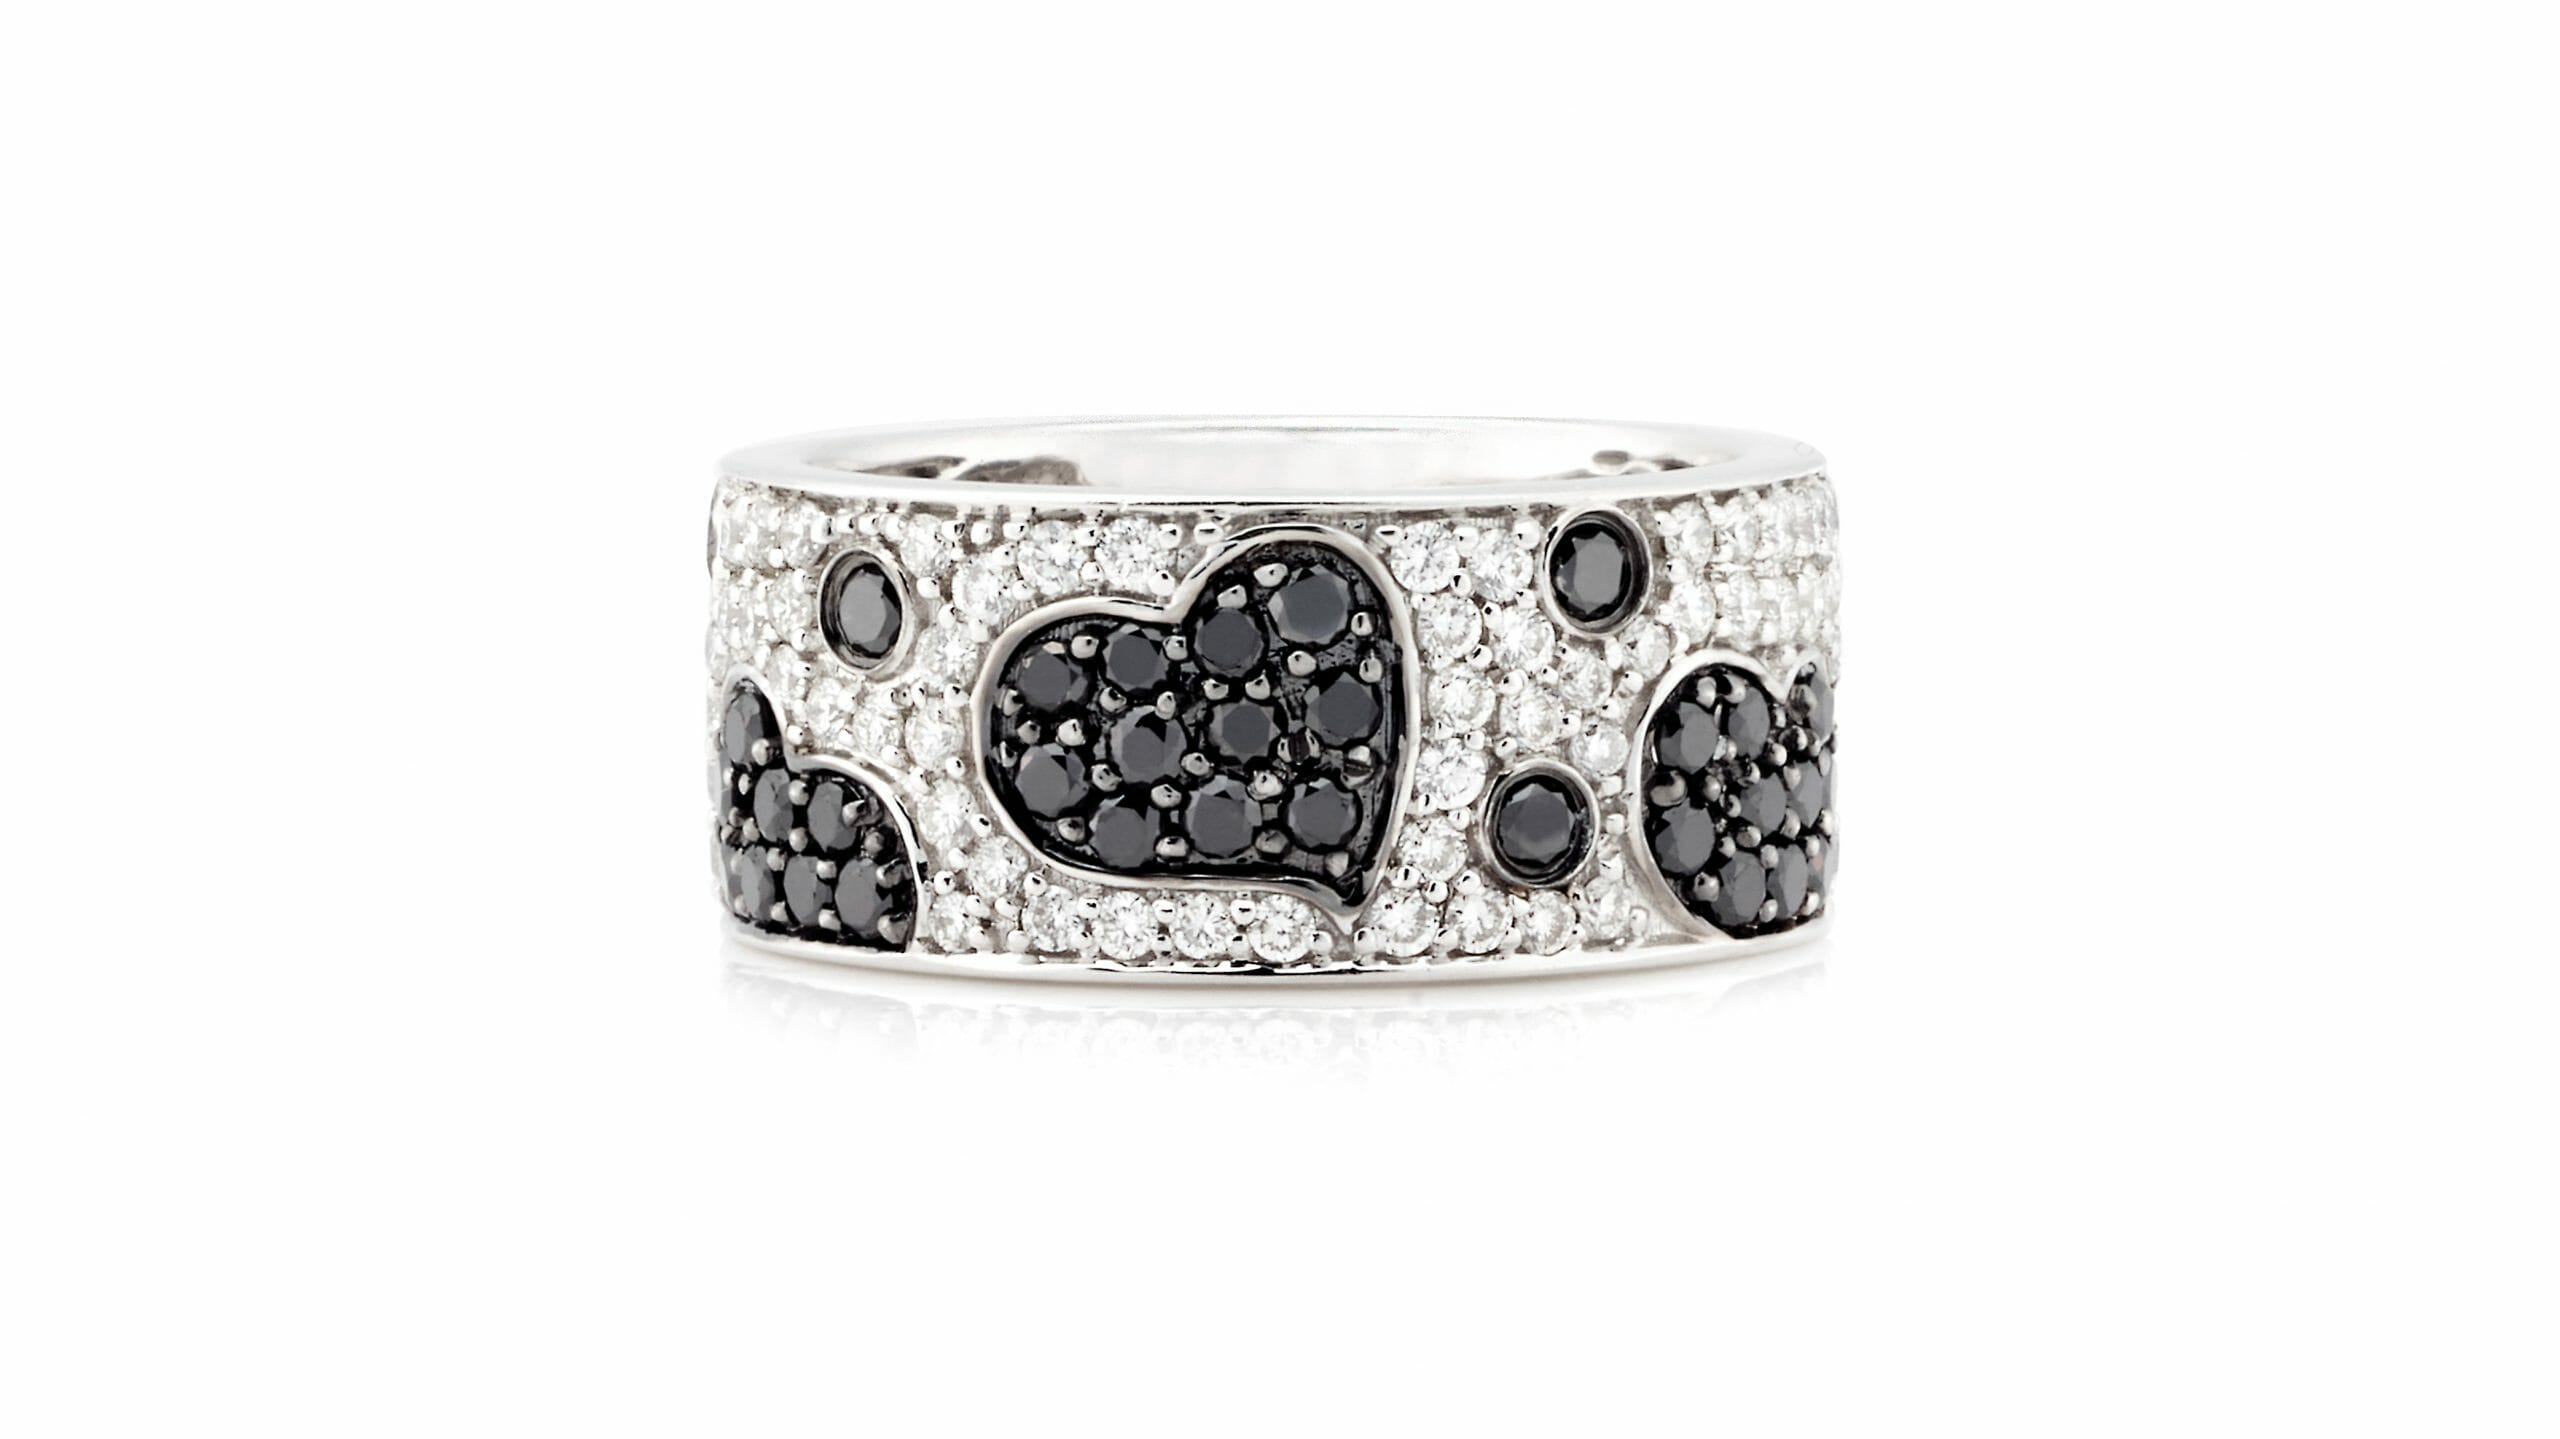 Black & White Diamonds Pavé Hearts Ring | Black & White Diamond Dress Ring Set In 18 Carat White Gold With Black And WHite Pavé-Set Diamonds In Heart Shapes